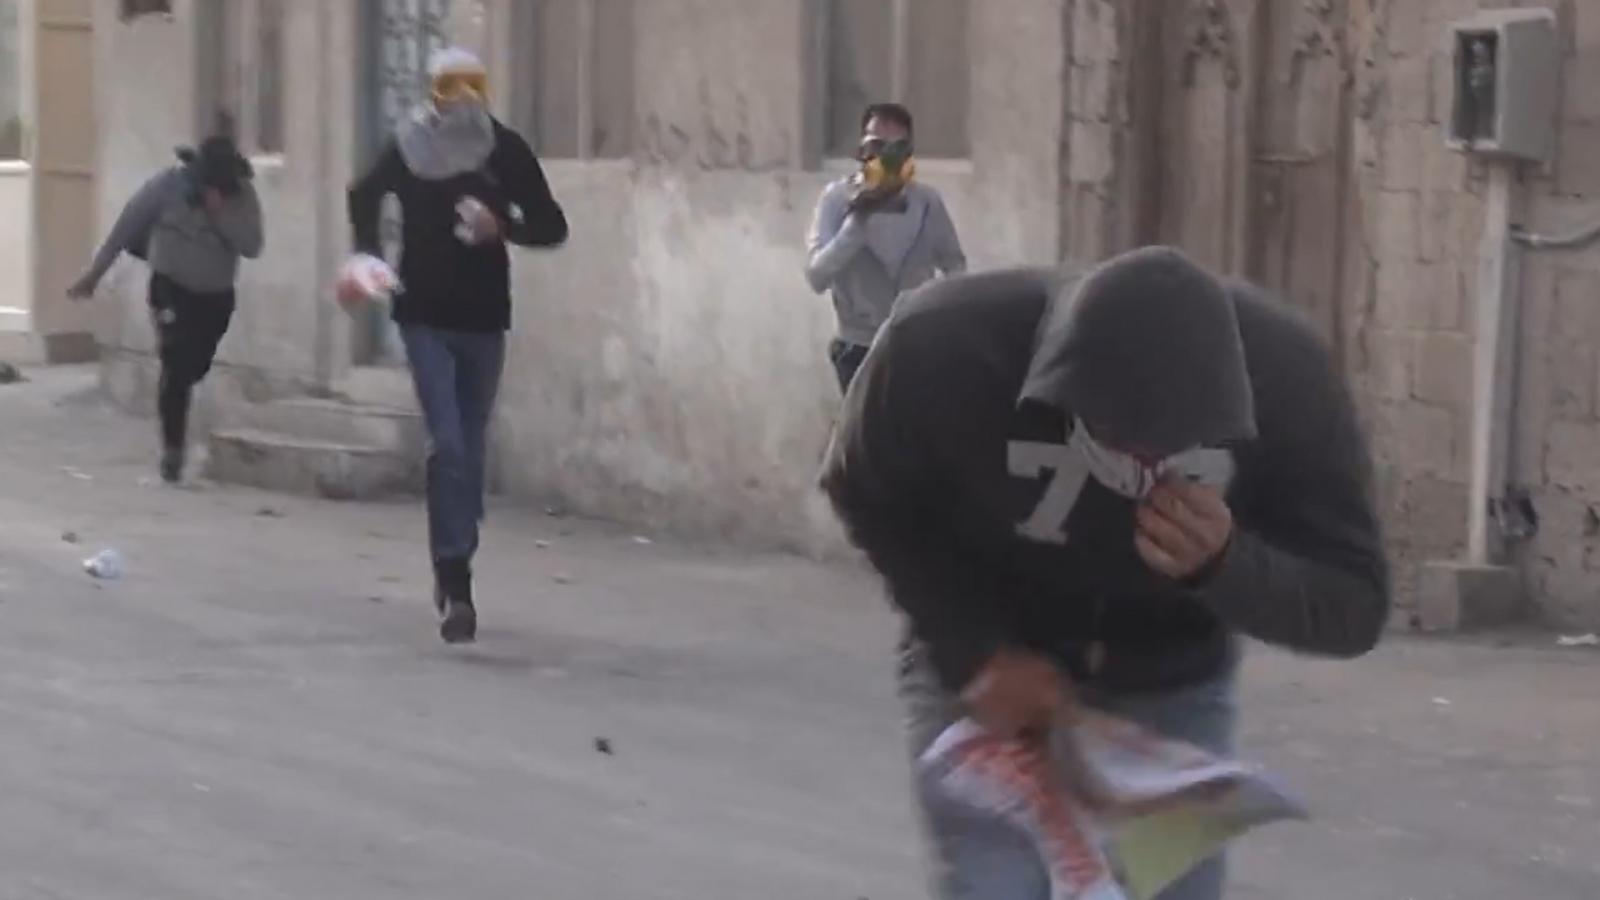 Bahrain: Video shows protester 'shot in face' for holding poster of opposition leader Sheikh Ali Salman